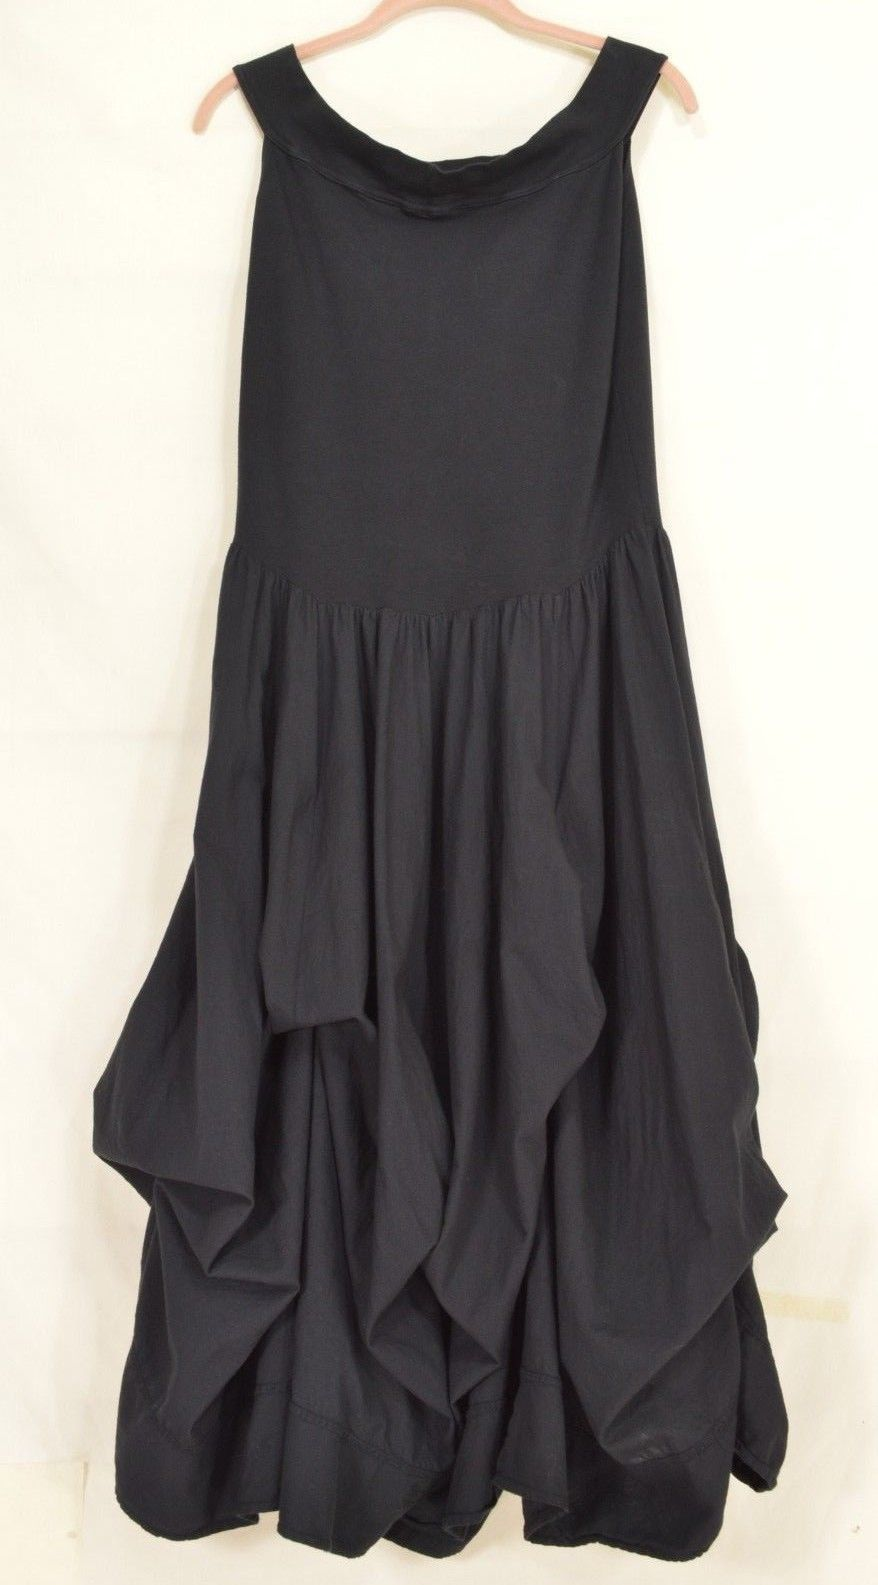 1 Luna Luz dress L black sleeveless balloon tie up parachute bottom full